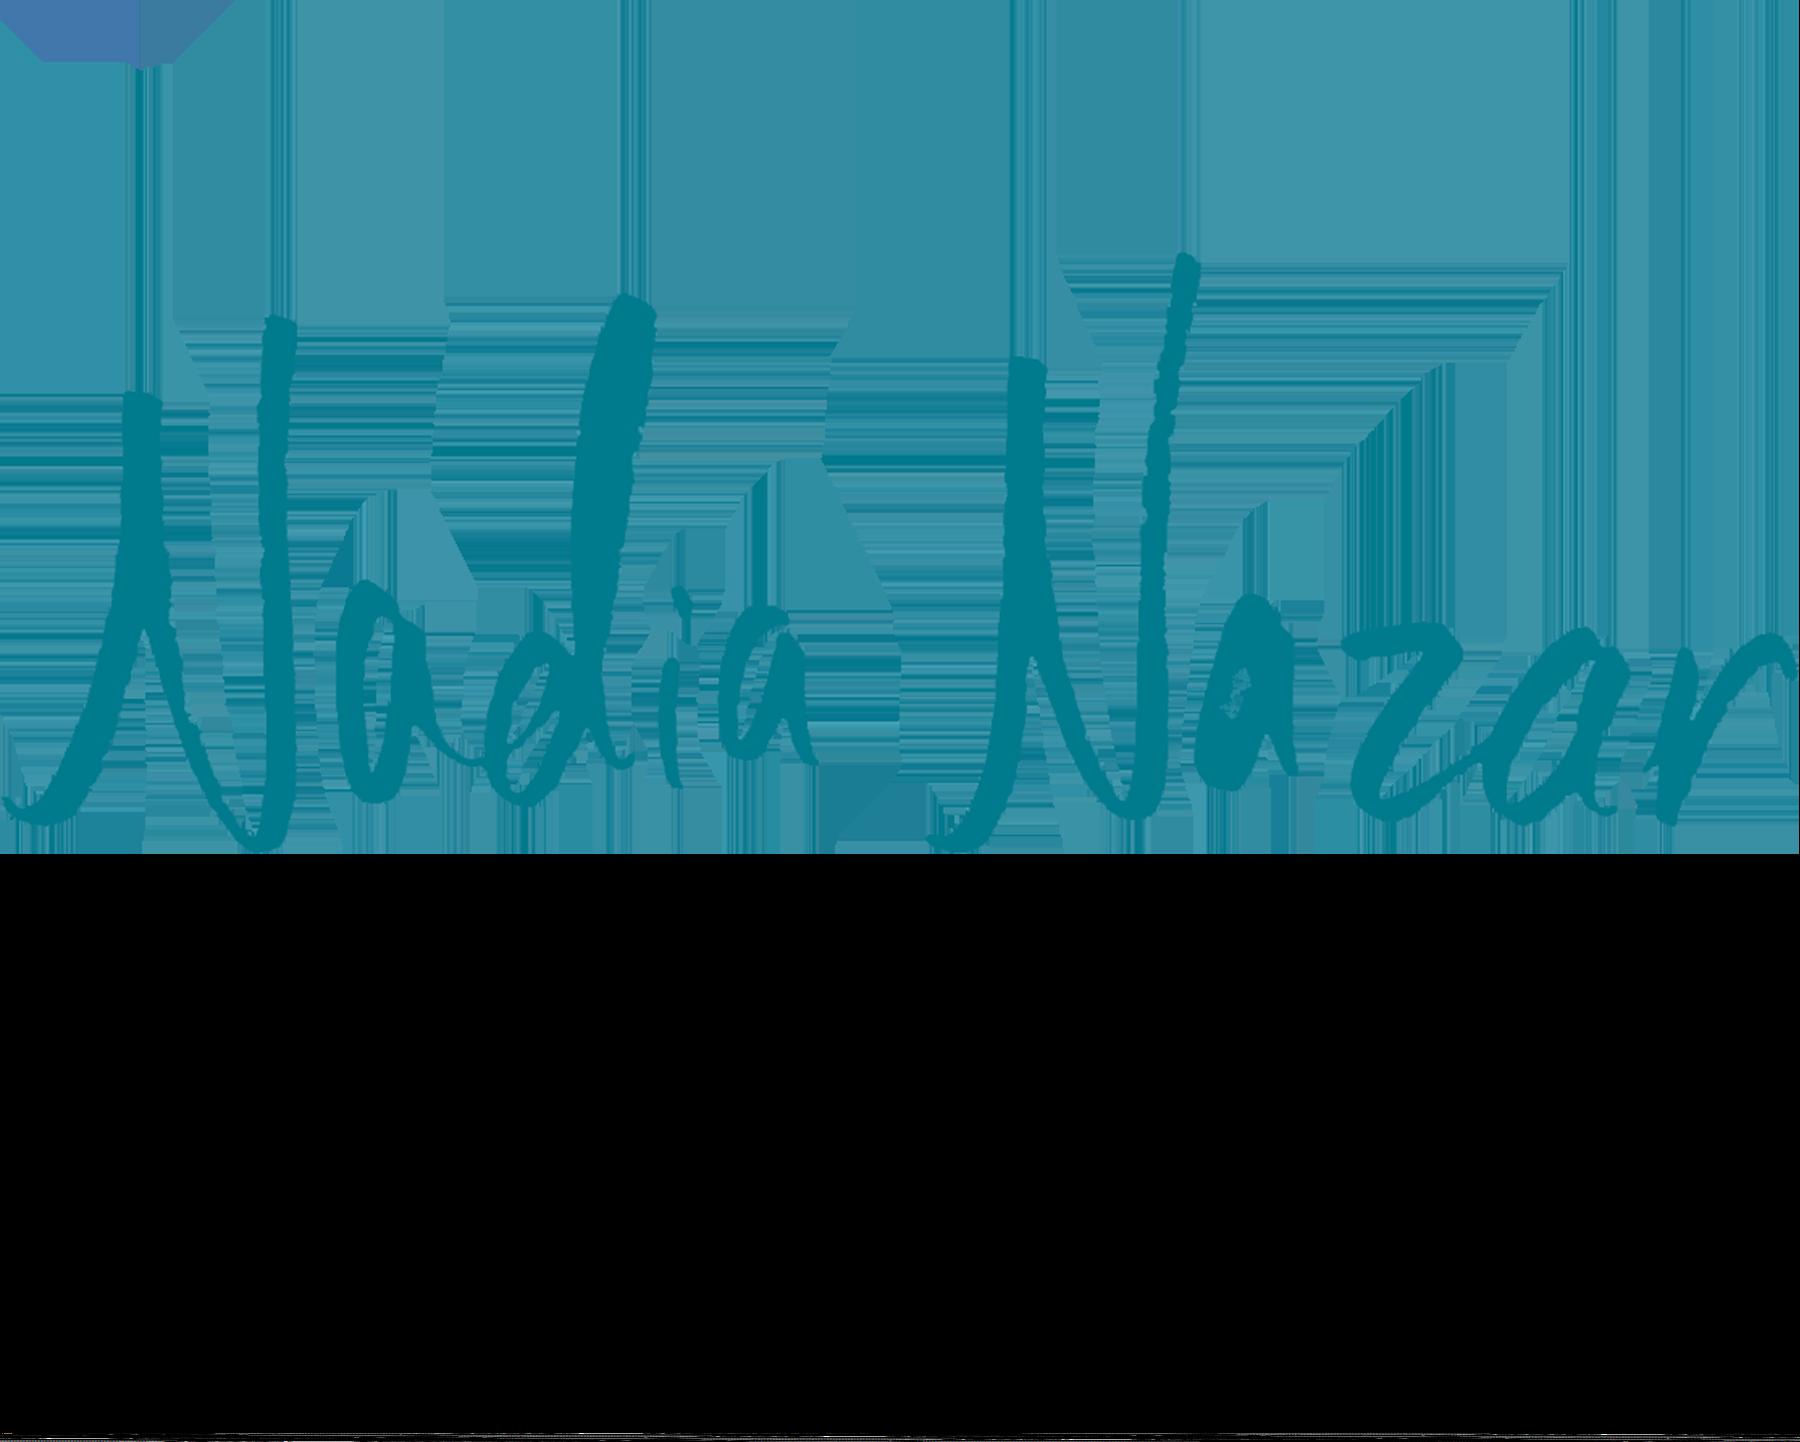 Nadia Nazar